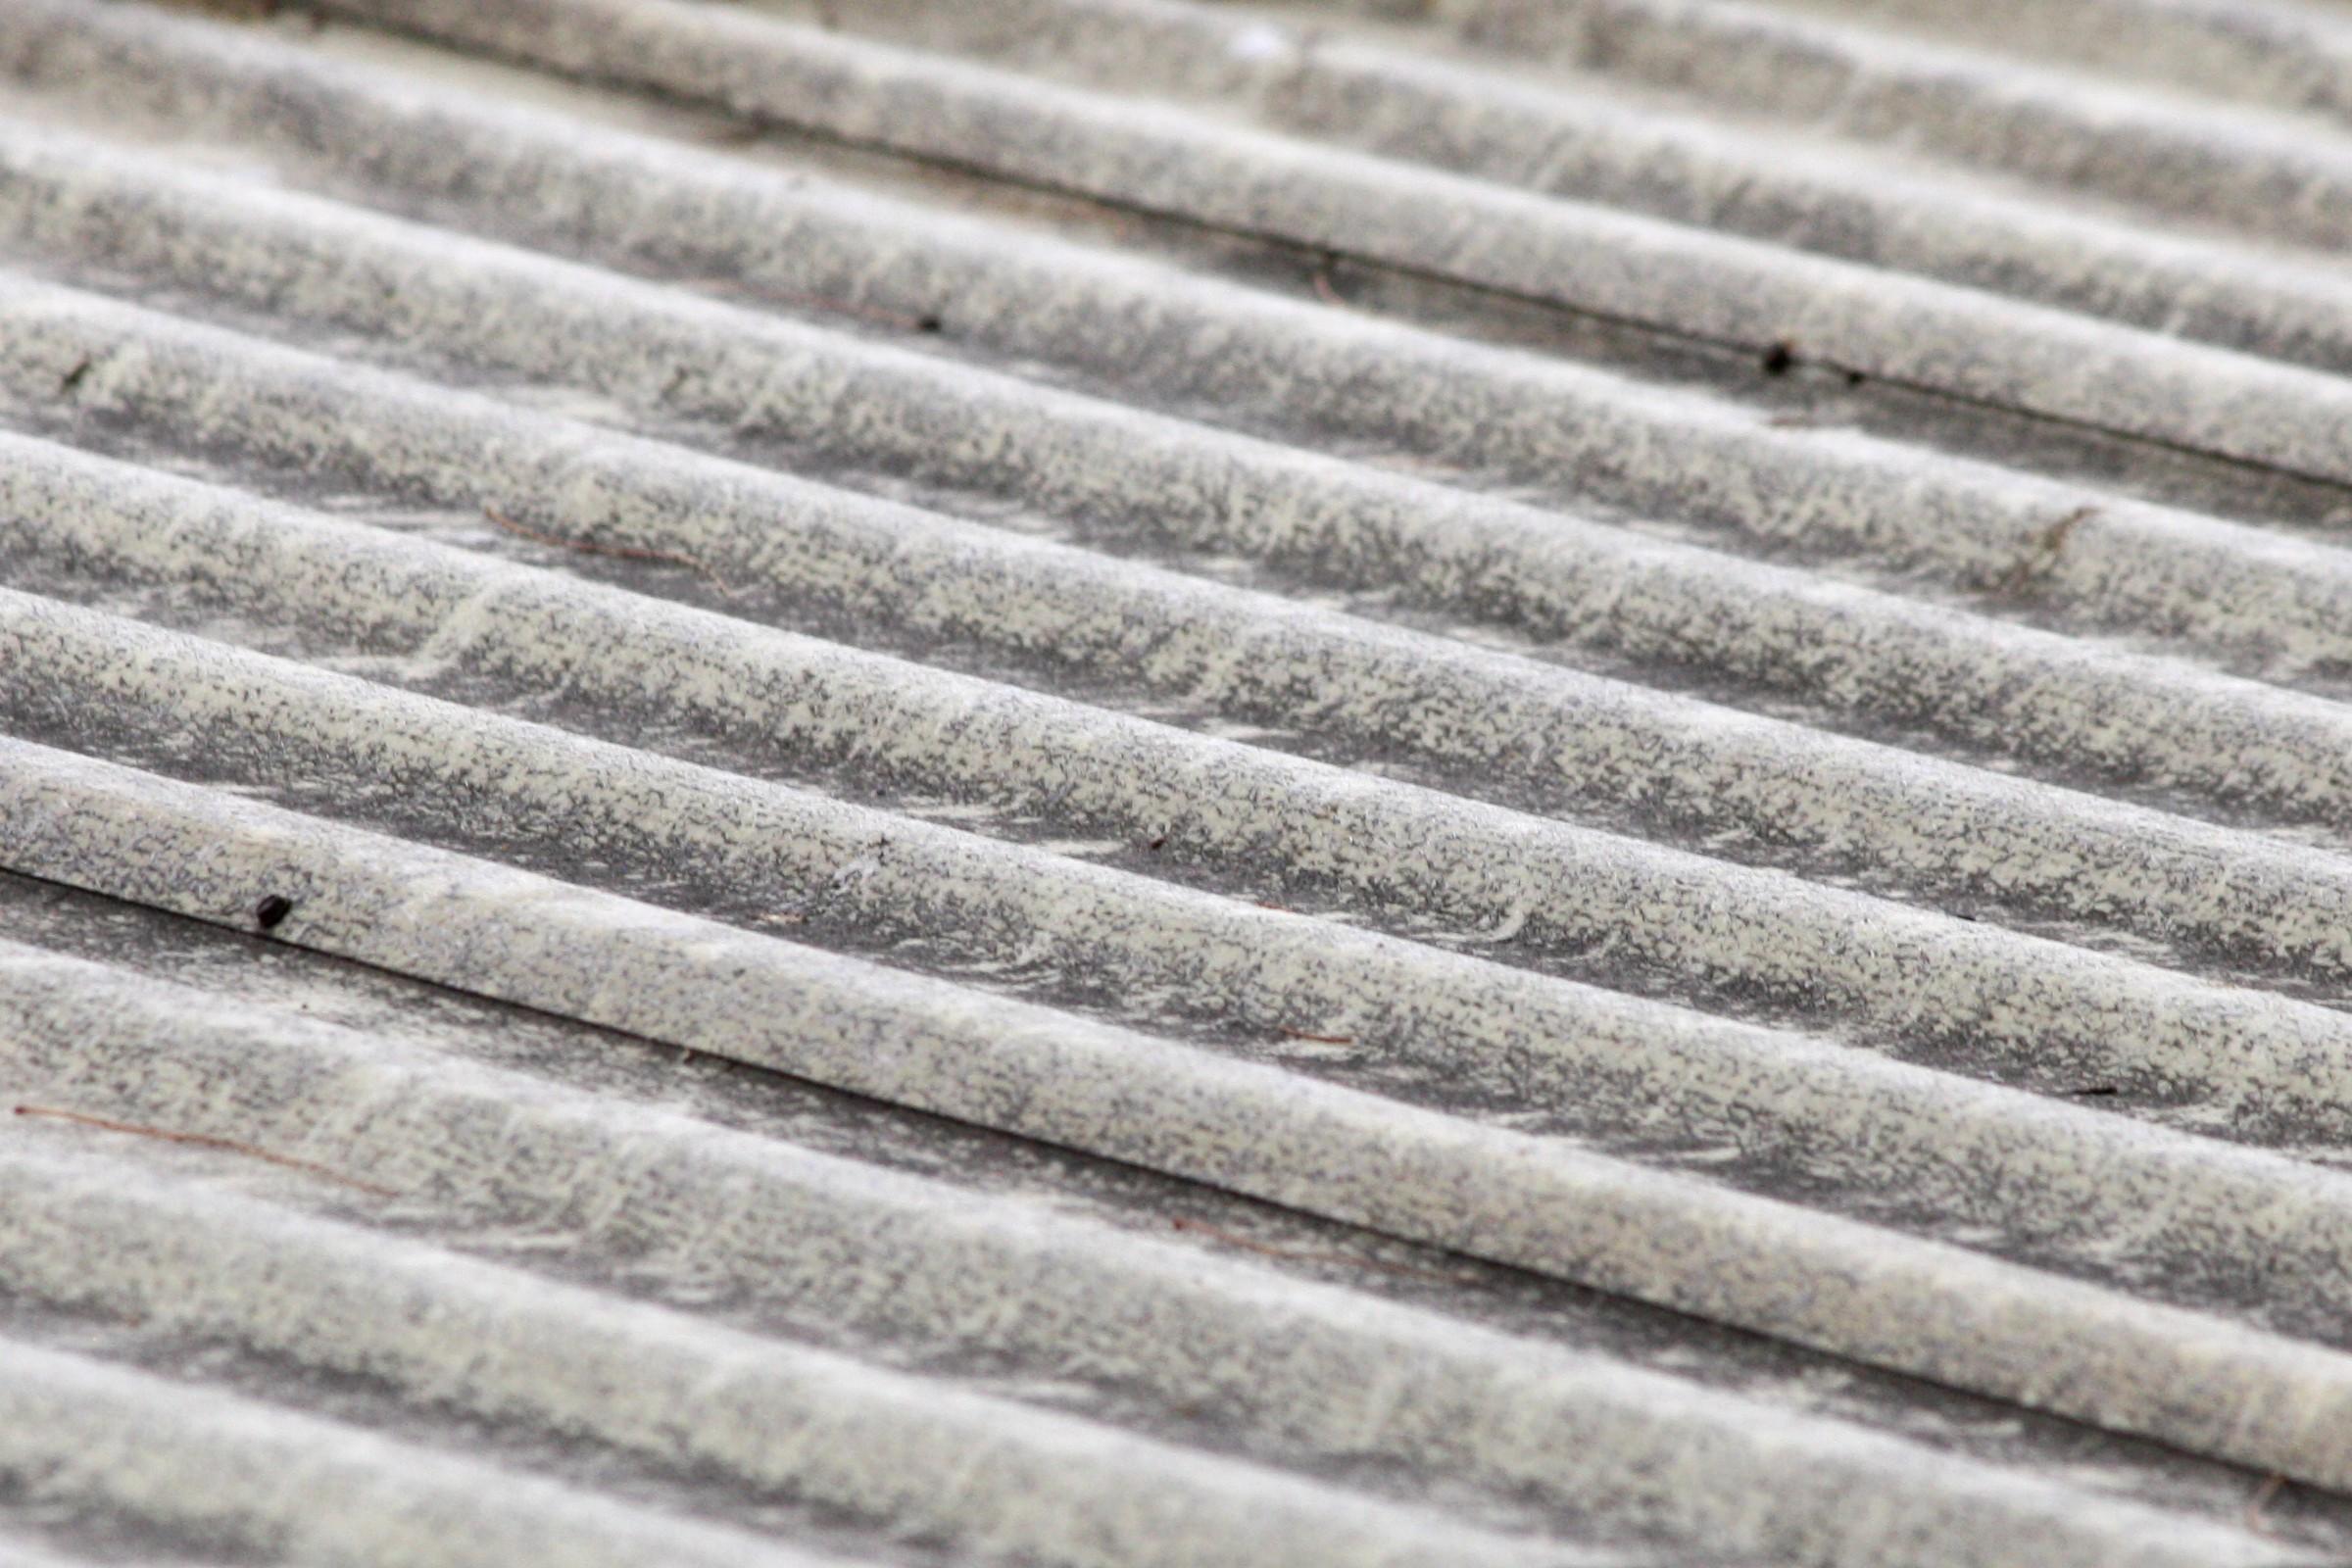 Corrugated Fiberglass Greenhouse Roof Texture